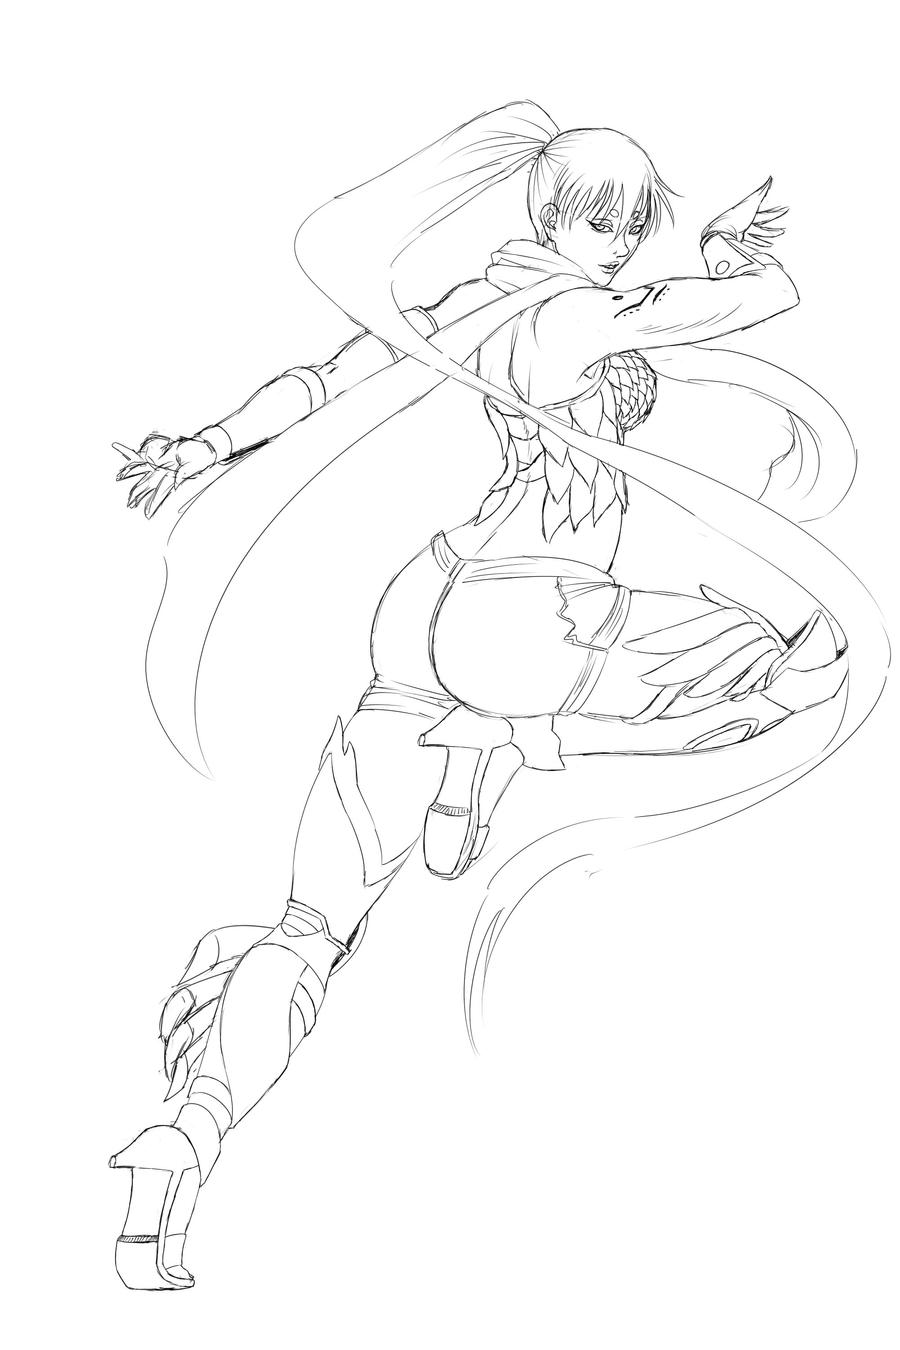 Yuzuriha Sketch by Ferenand